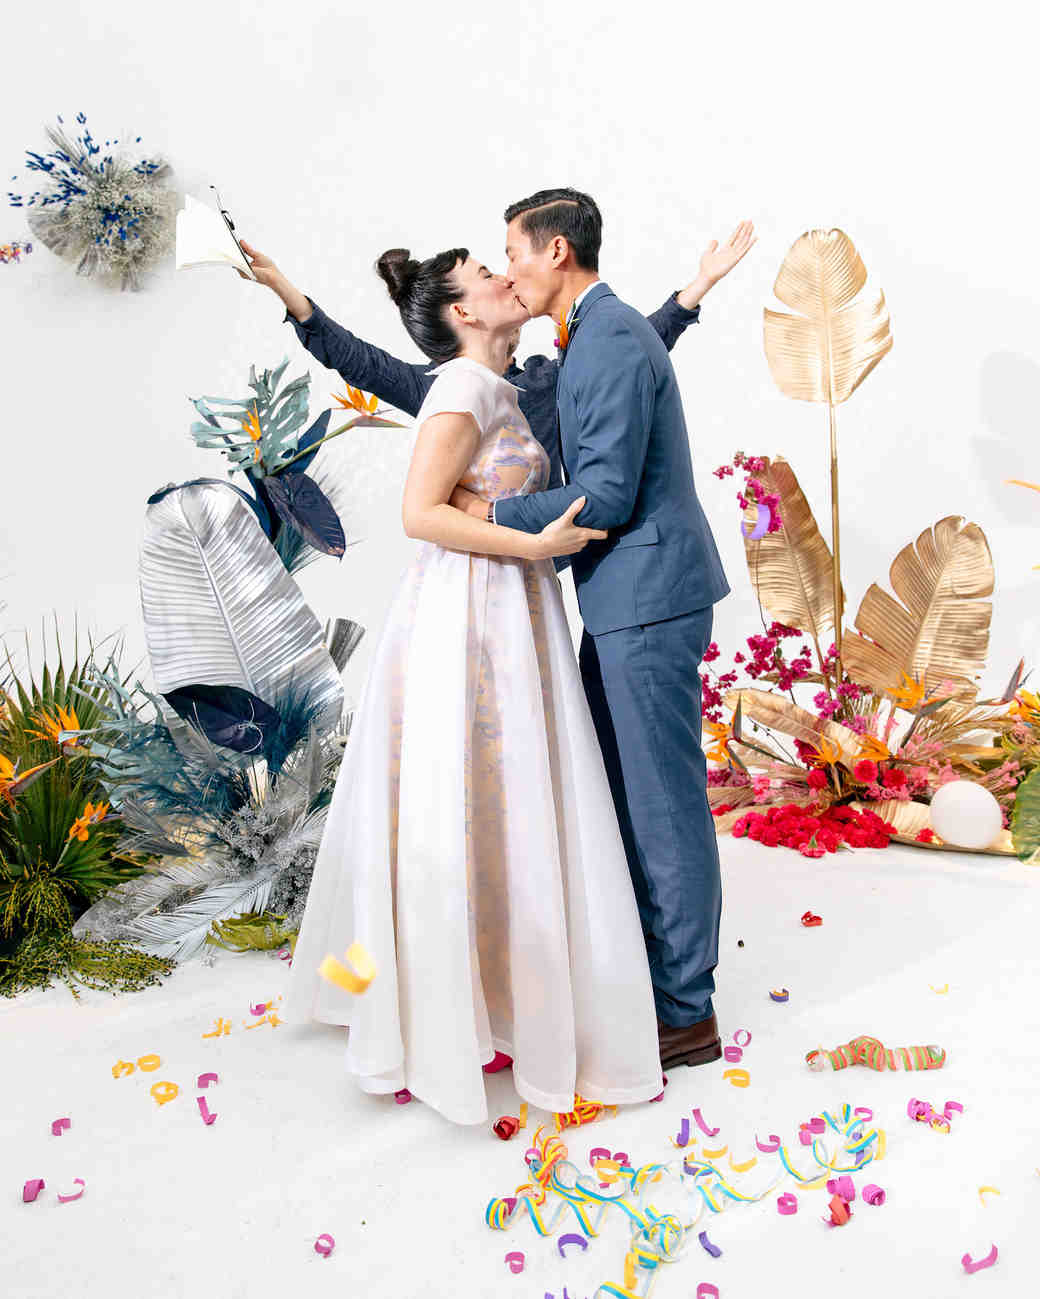 Wedding Backdrop Ideas We Love